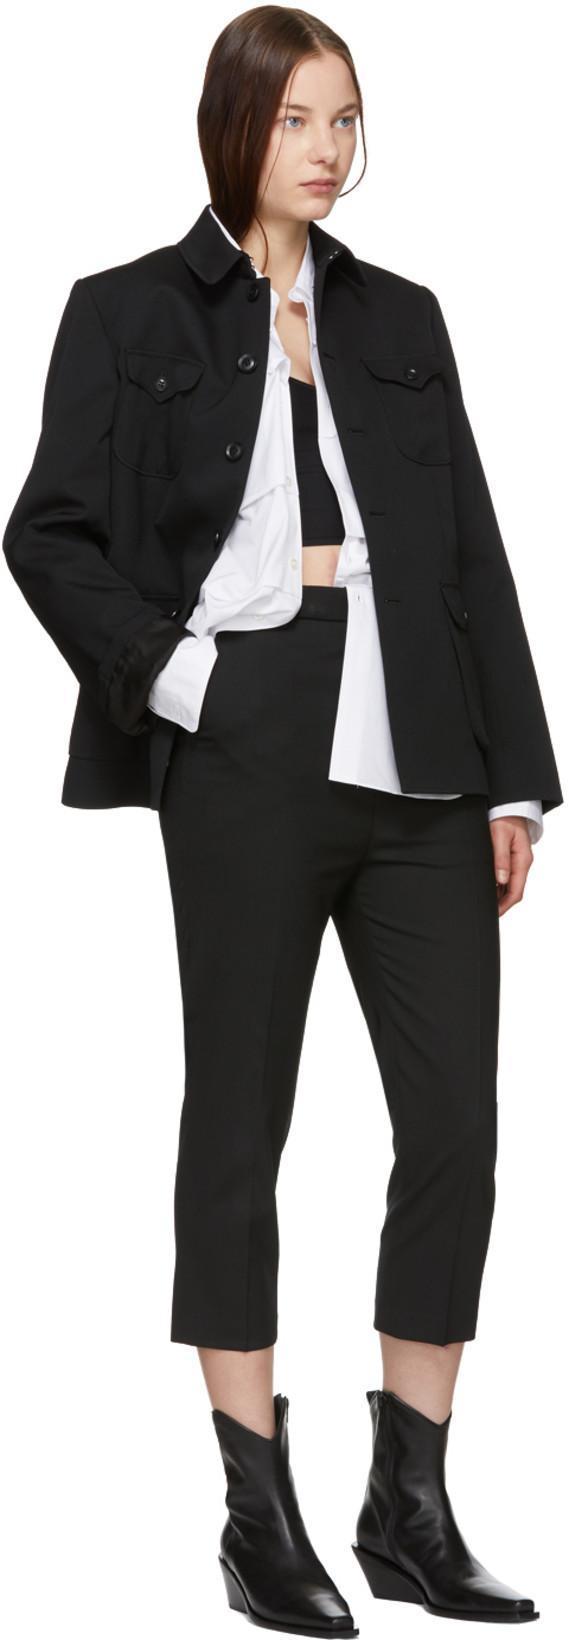 8d29f0a0fc8 ANN DEMEULEMEESTER Ann Demeulemeester Black La Fille Do Edition Jersey  Bralette